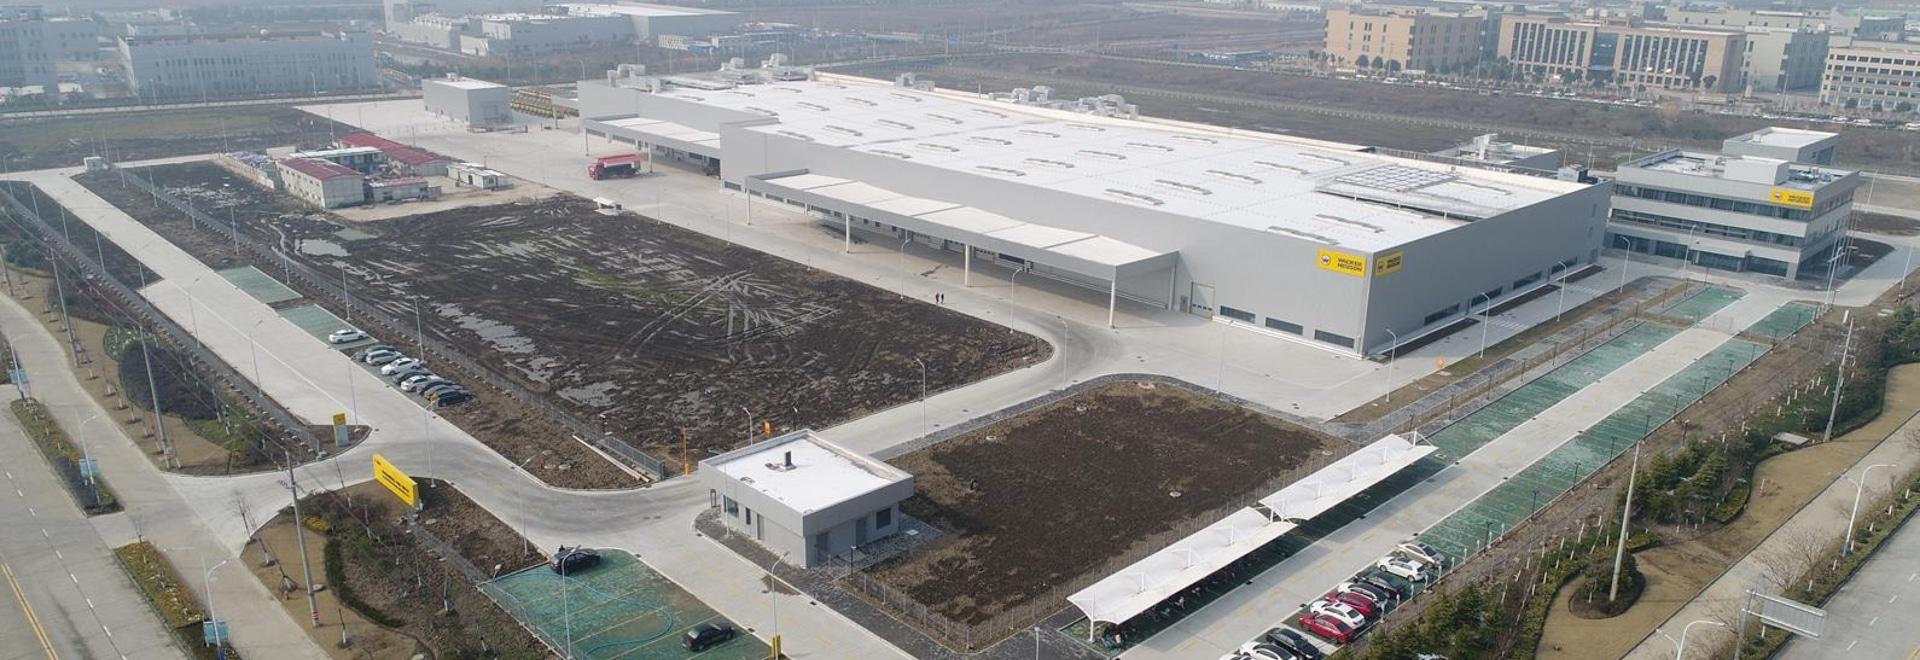 Aerial view of Wacker Neuson's new facility in Pinghu, China